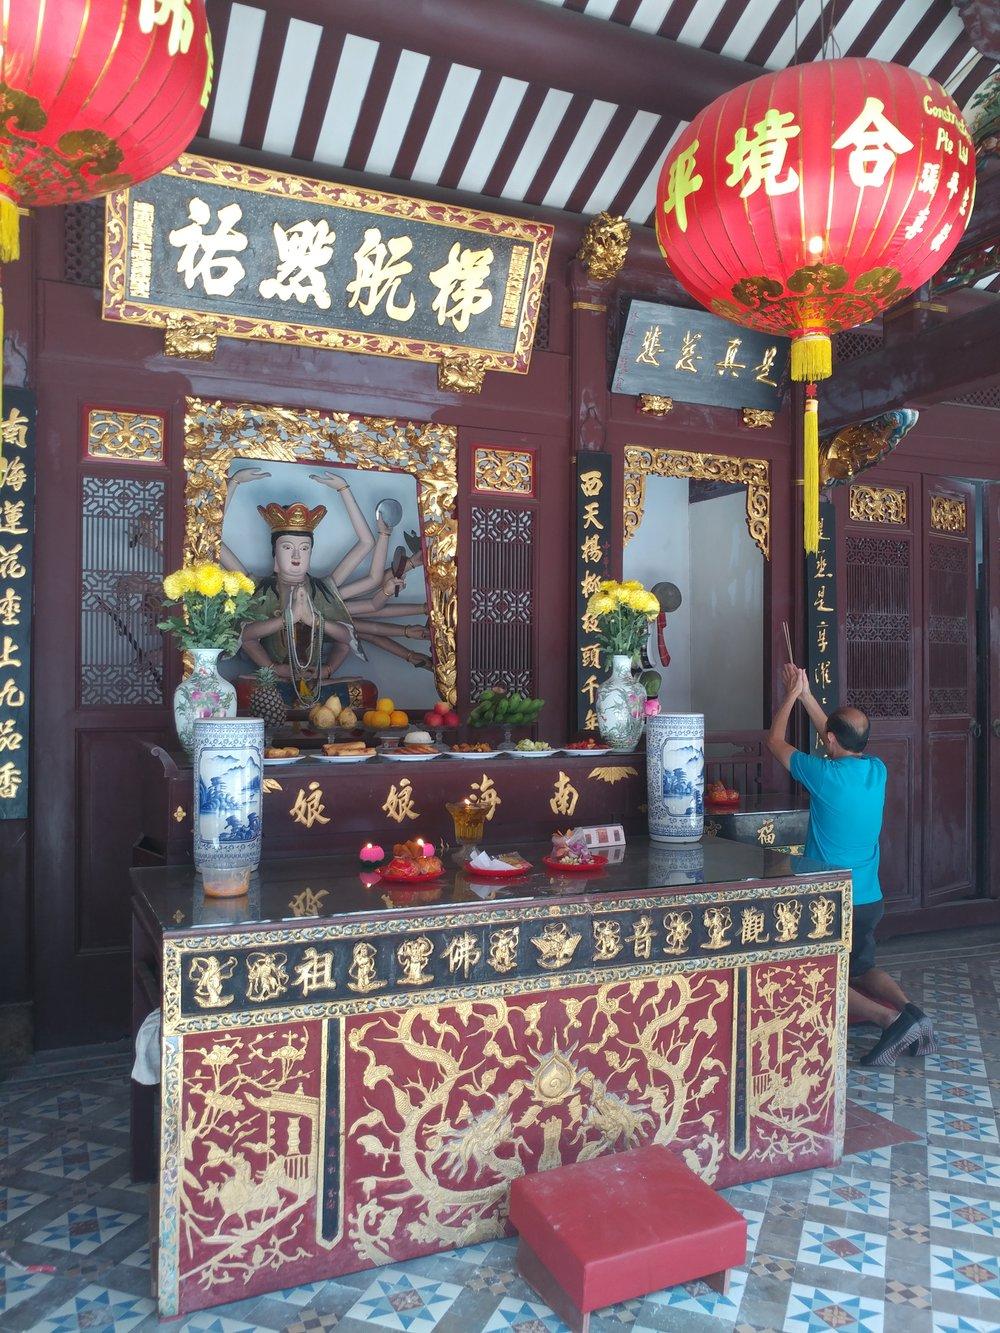 alter inside Thian Hock keng temple